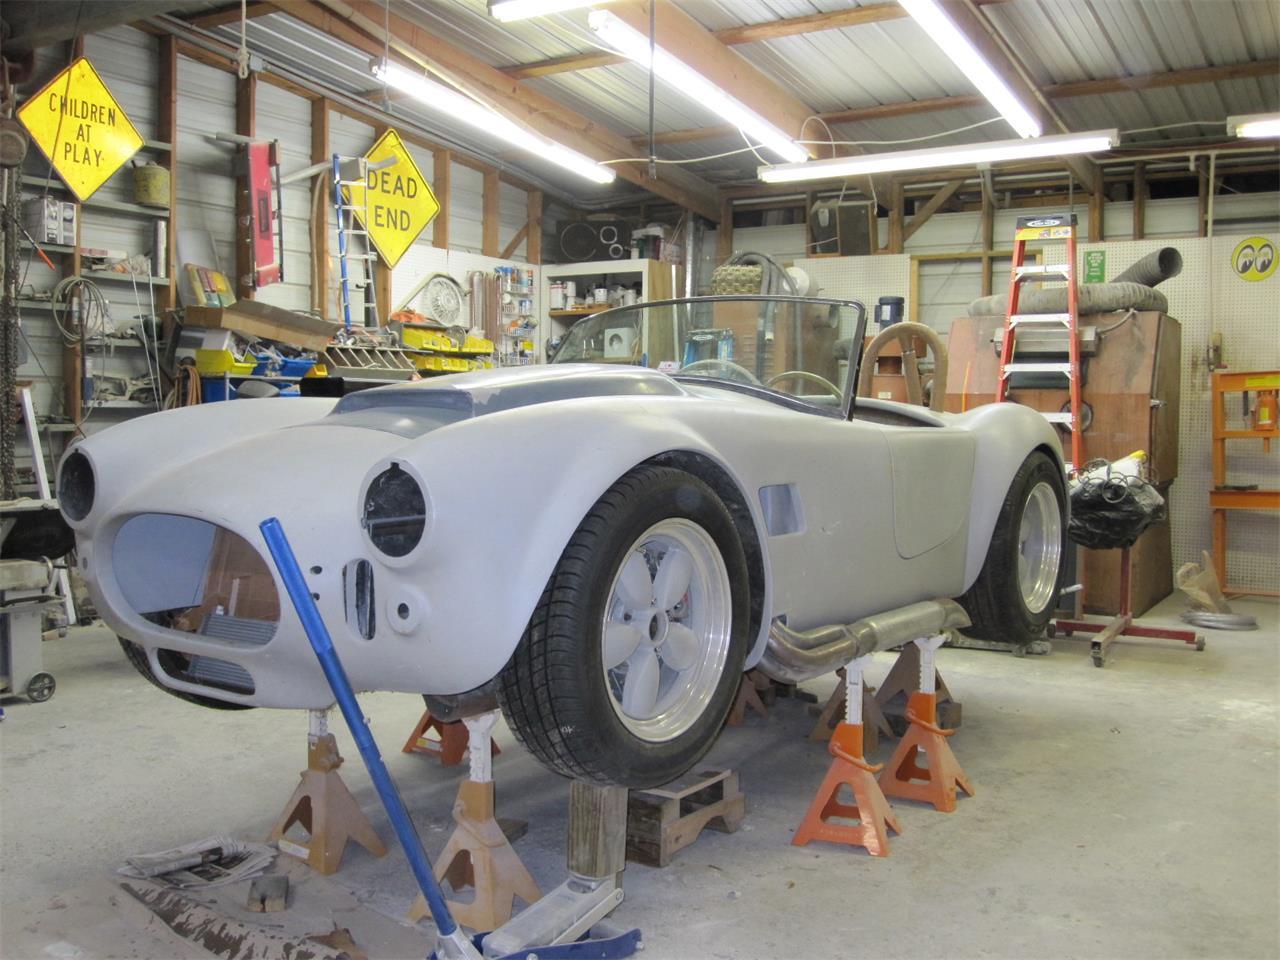 For Sale: 1966 Shelby Cobra Replica in Baton Rouge, Louisiana